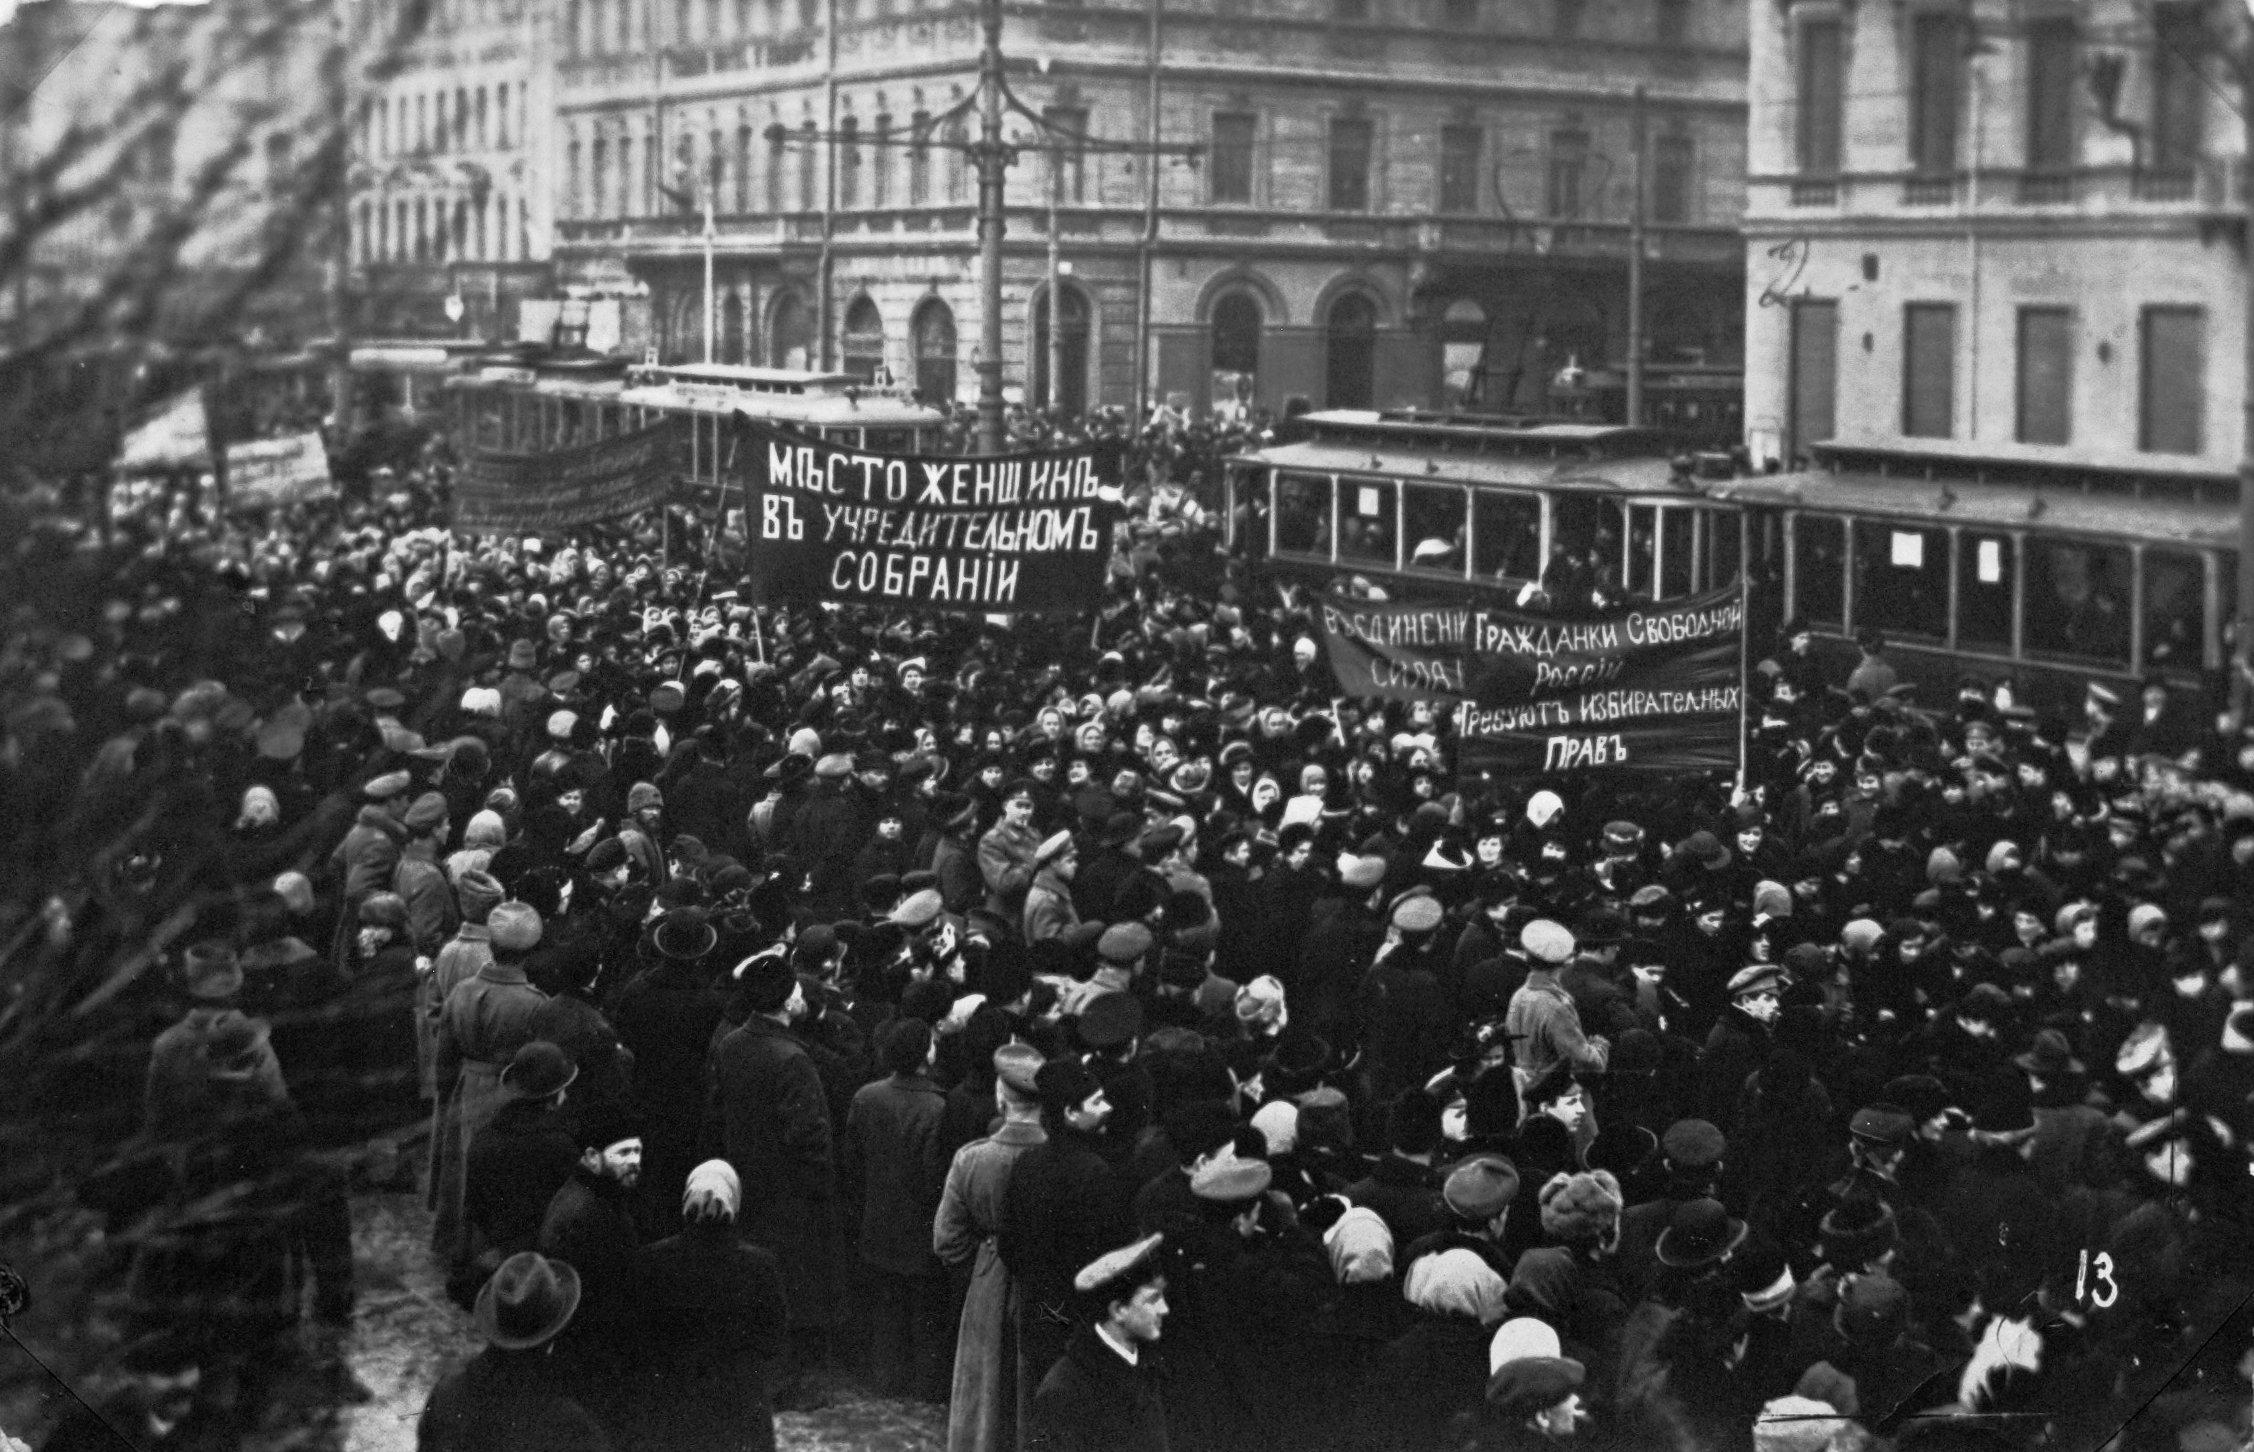 Митинг на Невском проспекте (1917).jpg